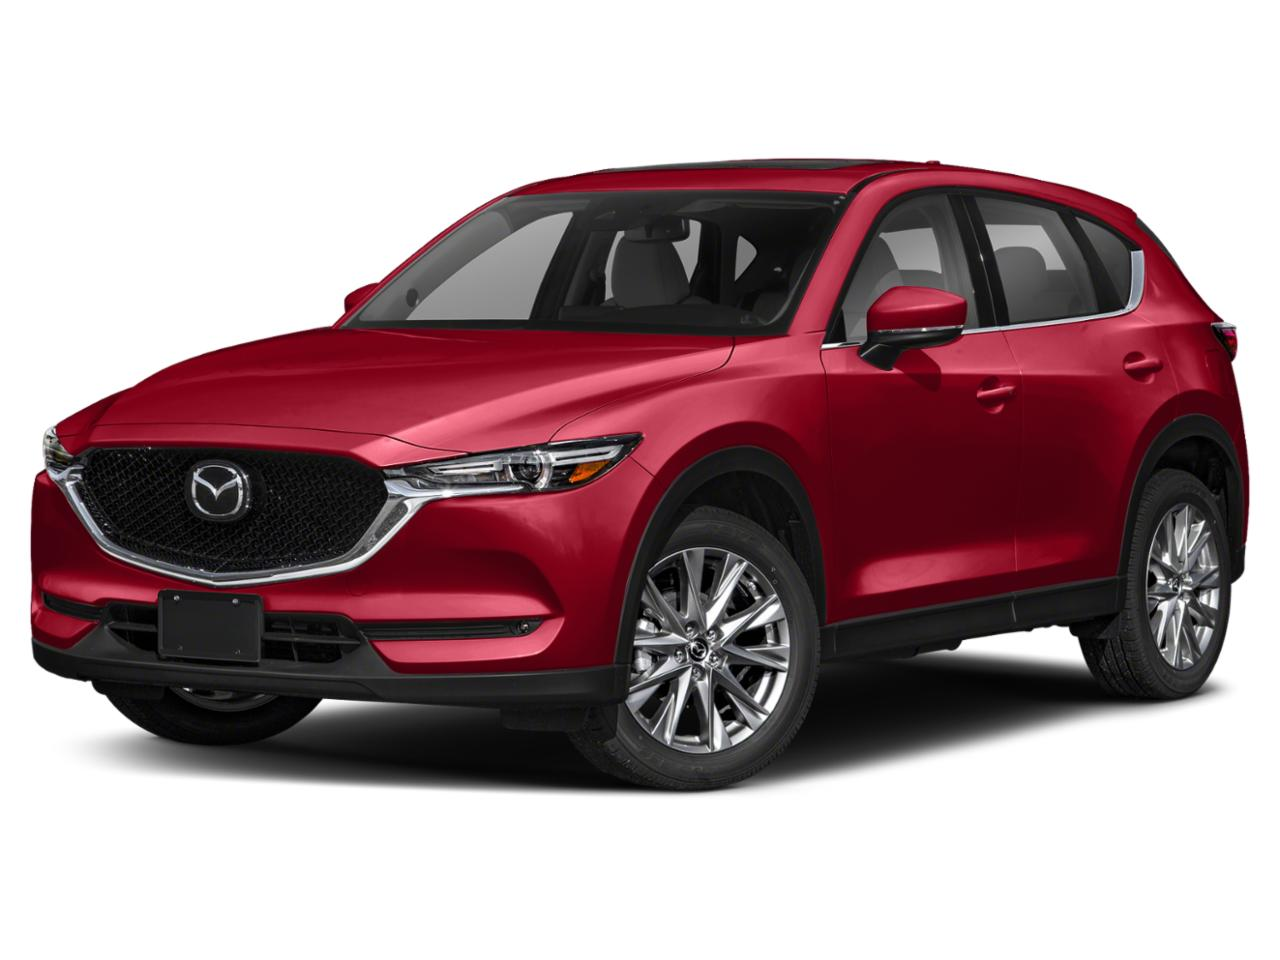 2020 Mazda CX-5 Vehicle Photo in San Antonio, TX 78230